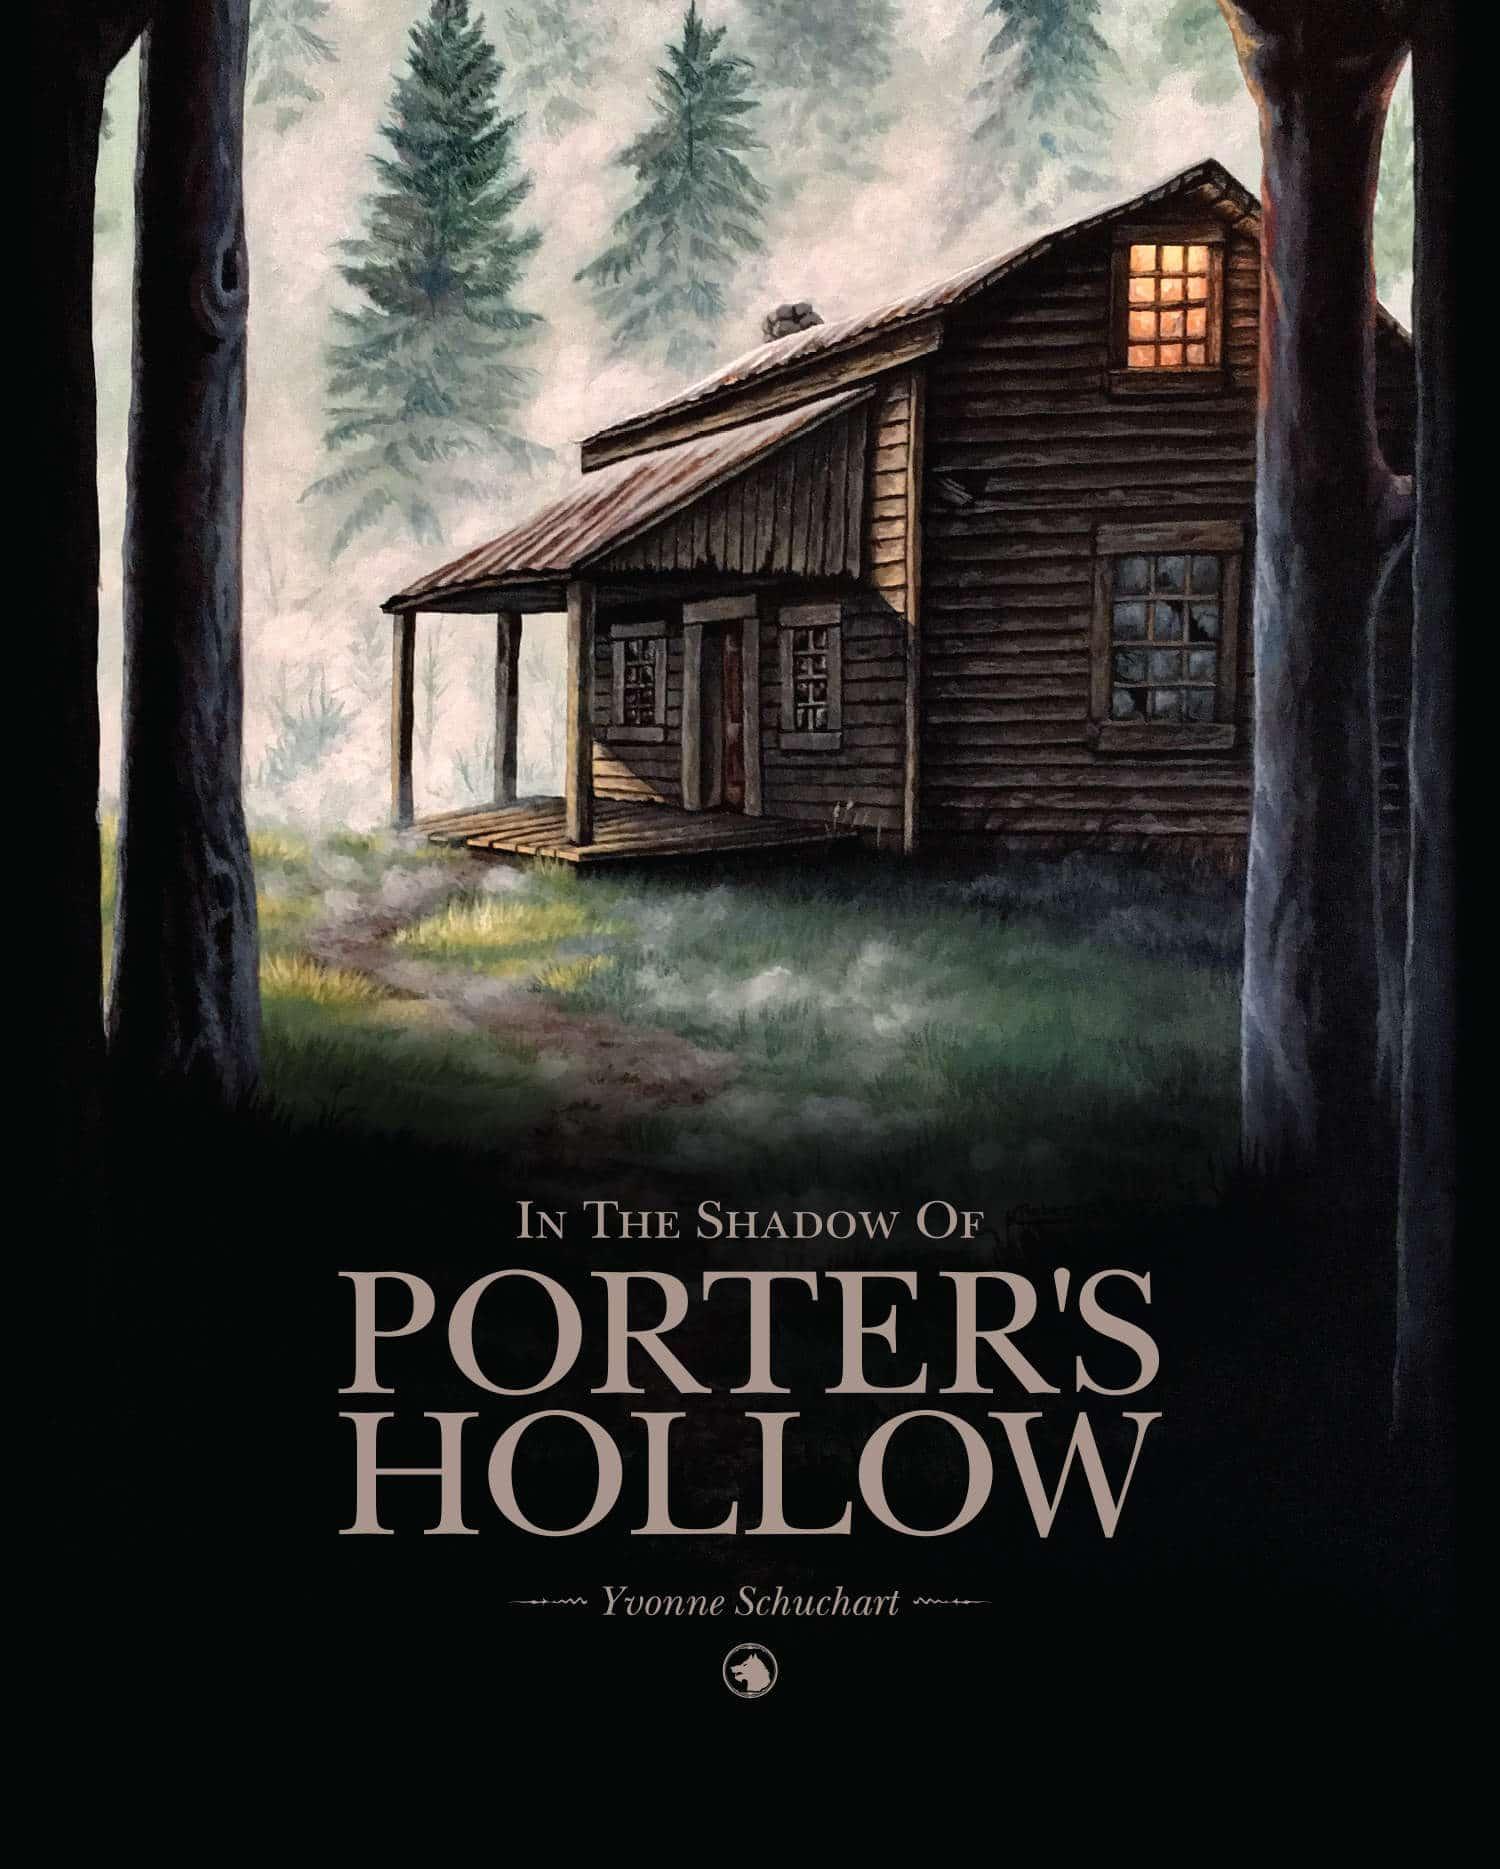 Porter's Hollow Poster Design